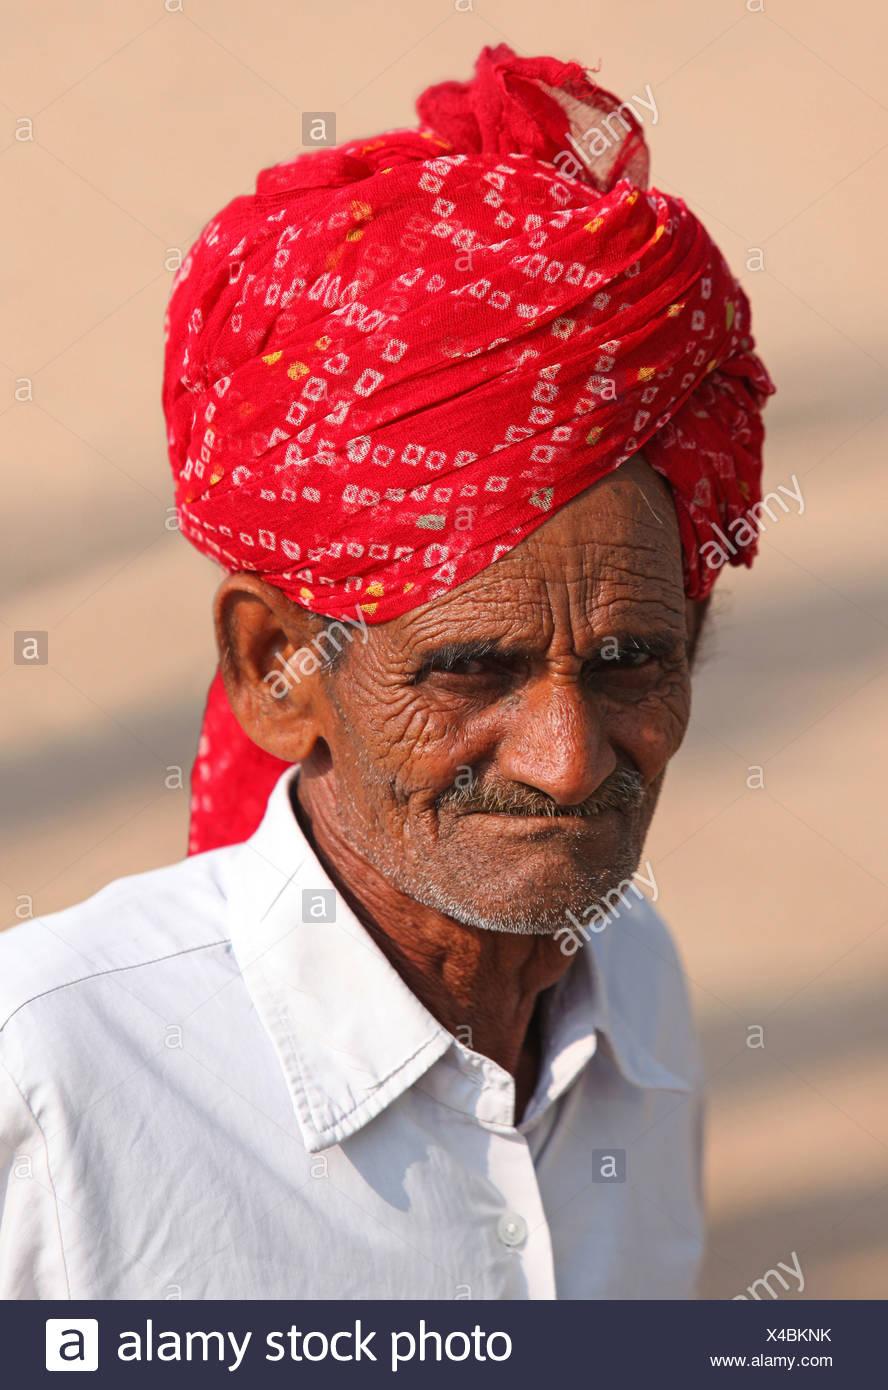 Man, old, folds, wrinkles, turban, look, glance, portrait, Bundi, India, Asia, Rajasthan, - Stock Image